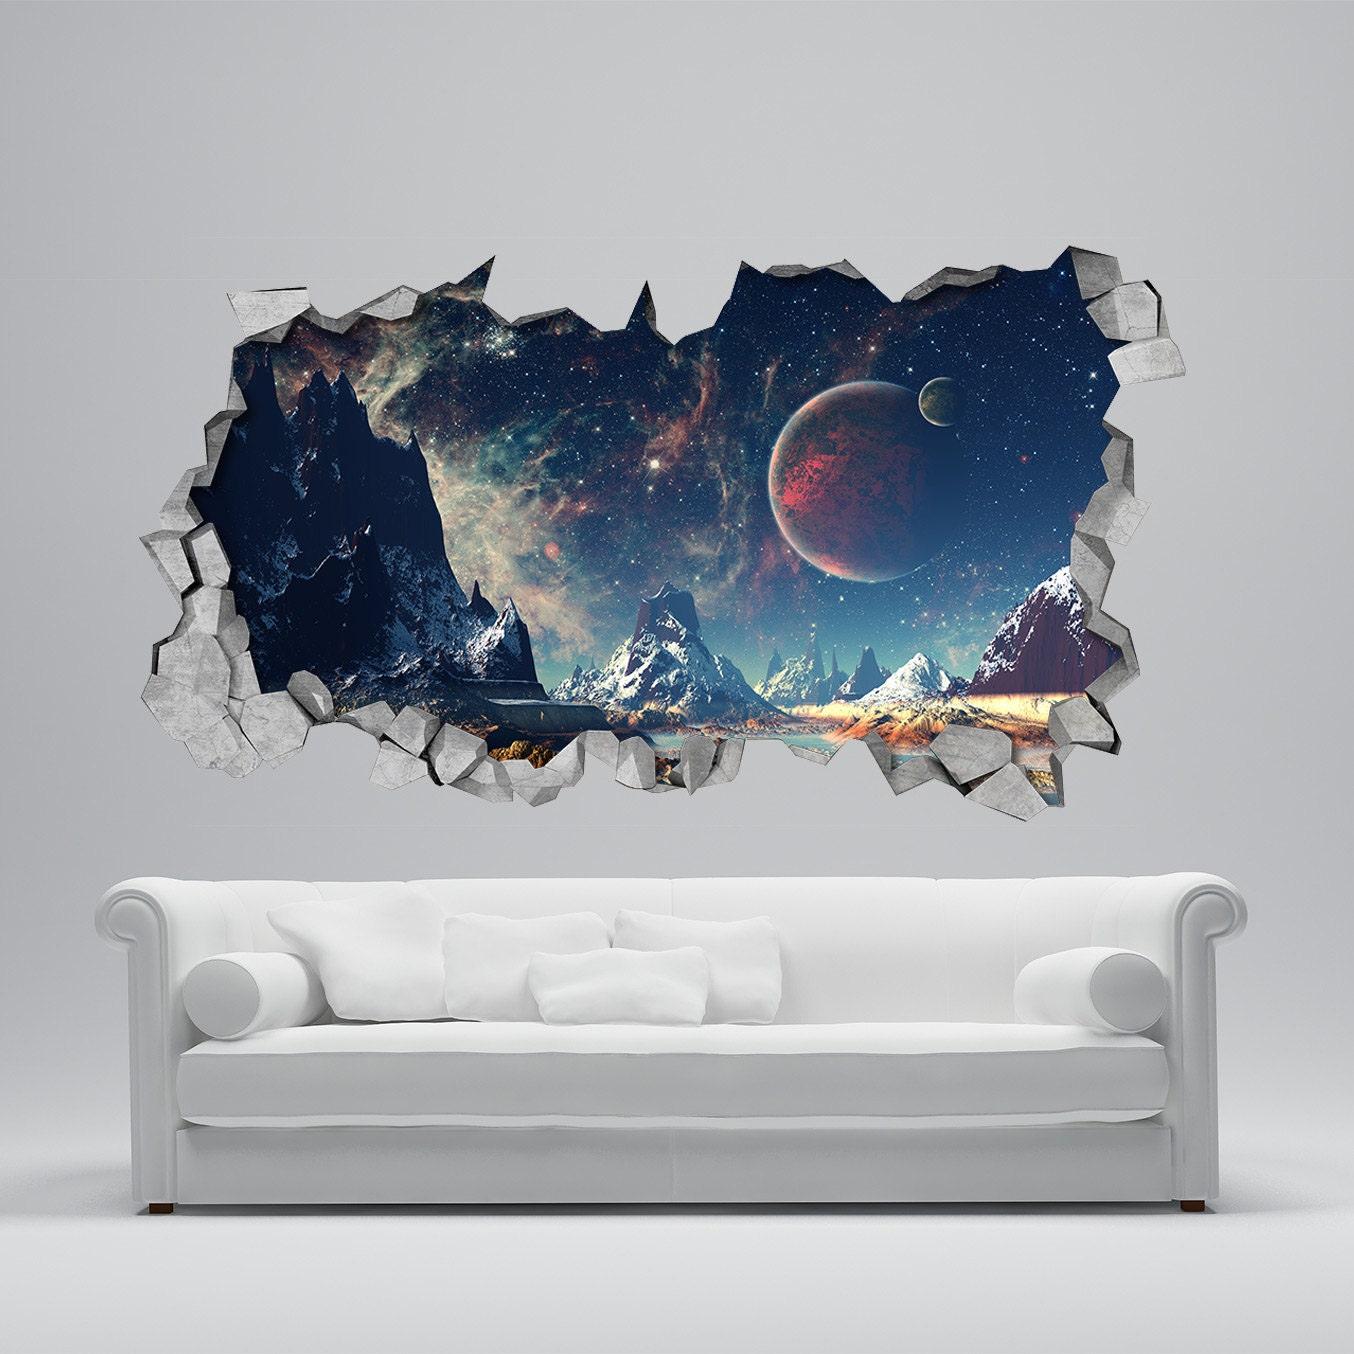 Space Broken Wall Decal 3d Wallpaper 3d wall decals 3d for 3d Wall Graphic Design  535wja